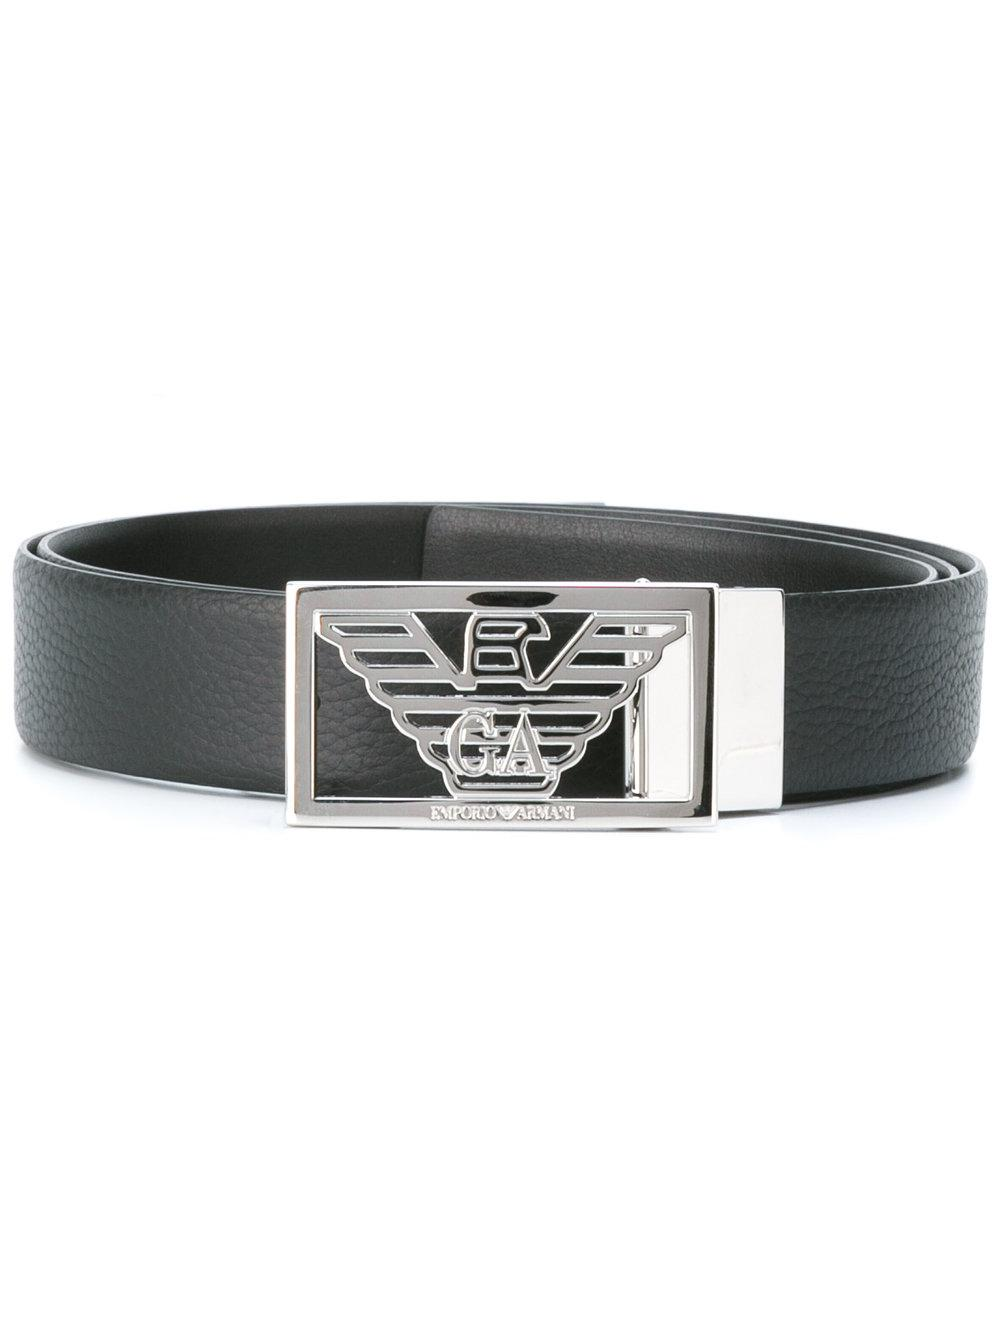 Emporio armani Logo Buckle Belt in Black for Men   Lyst